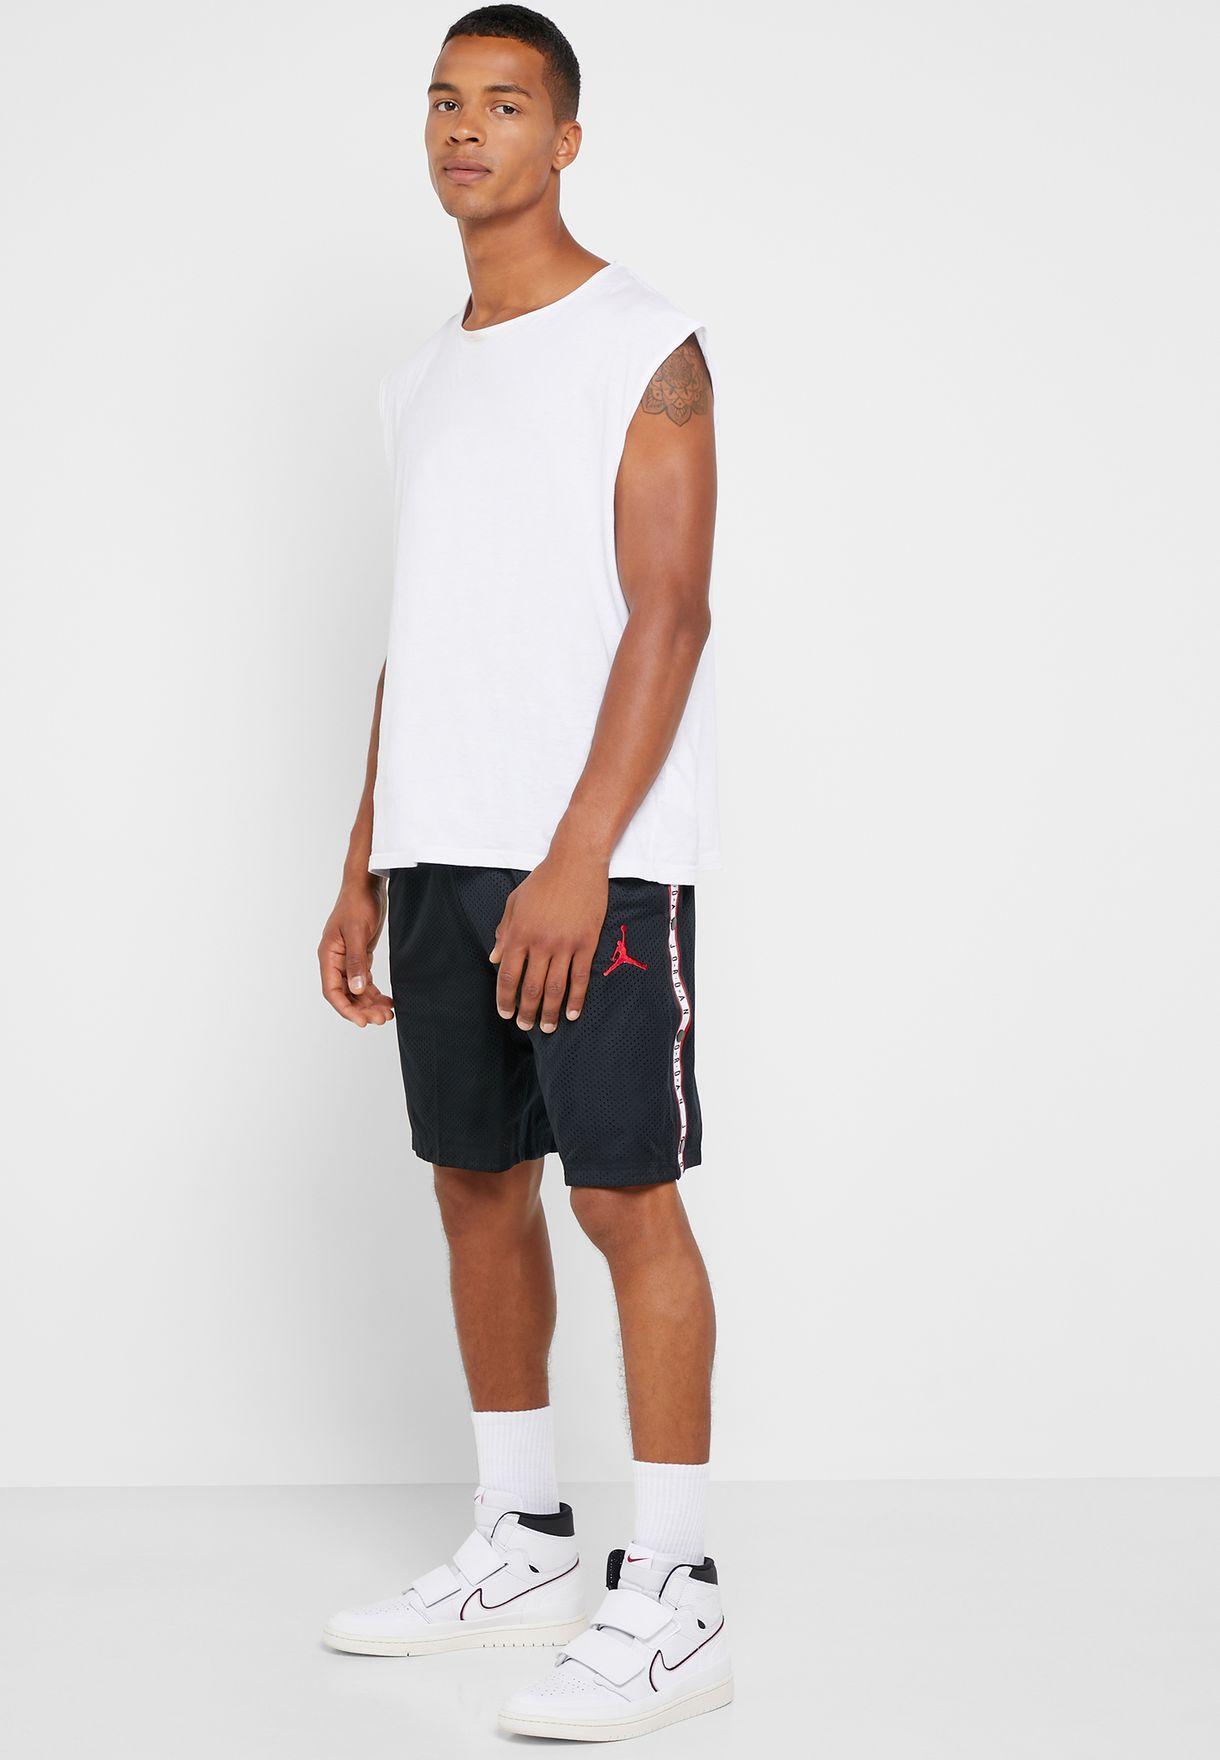 c44d6b3bcb7 Shop Nike black Air Jordan Tear Away Shorts AJ1146-010 for Men in ...